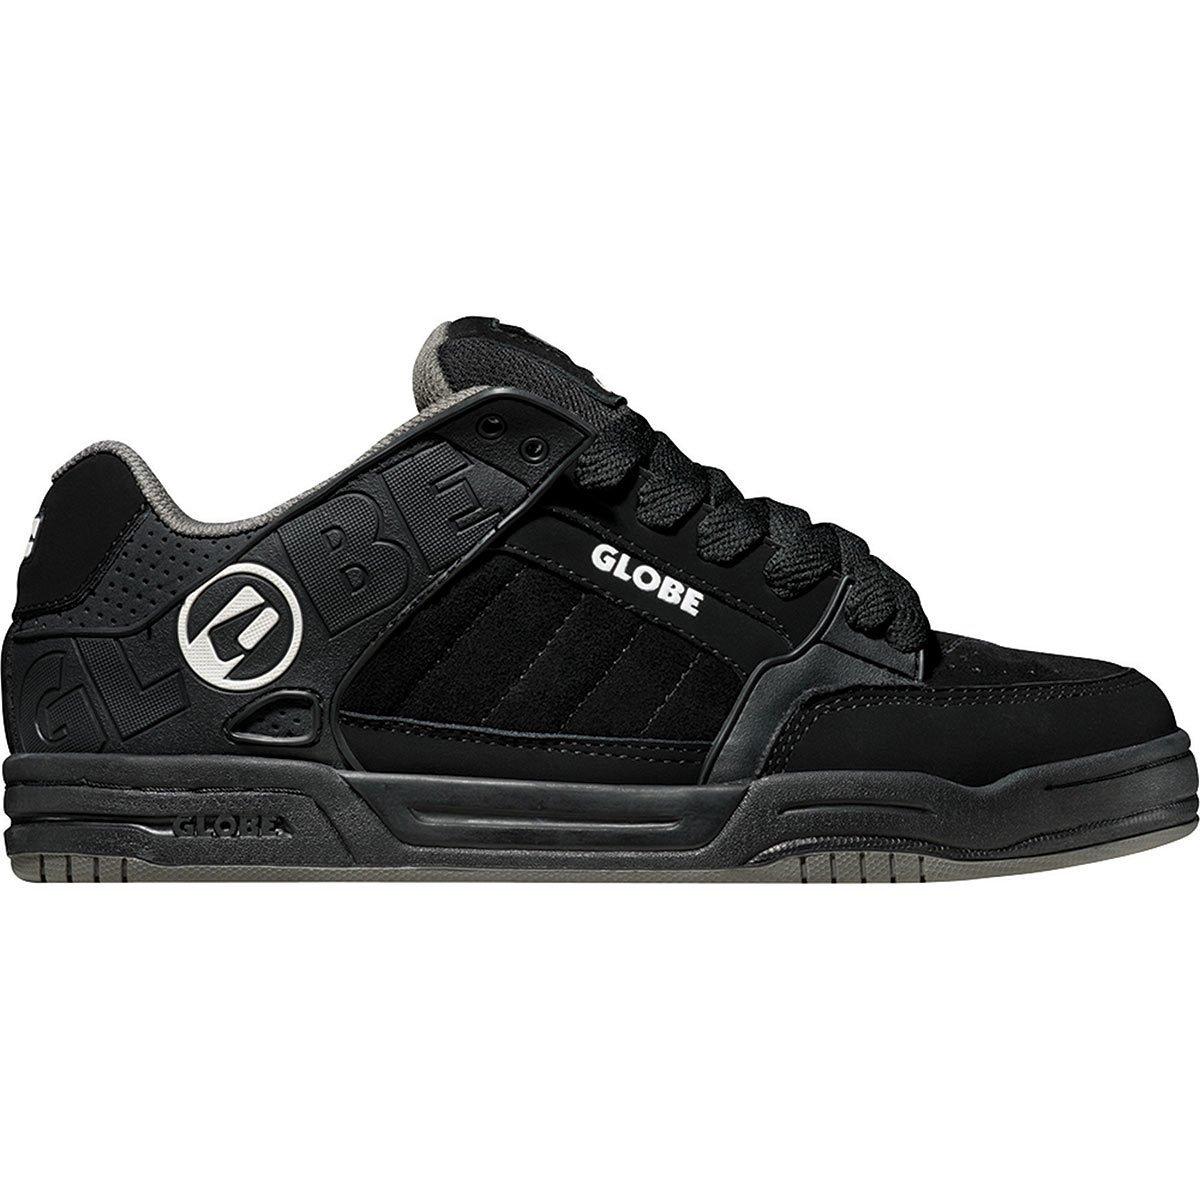 Globe Tilt Shoe Black/Black TPR